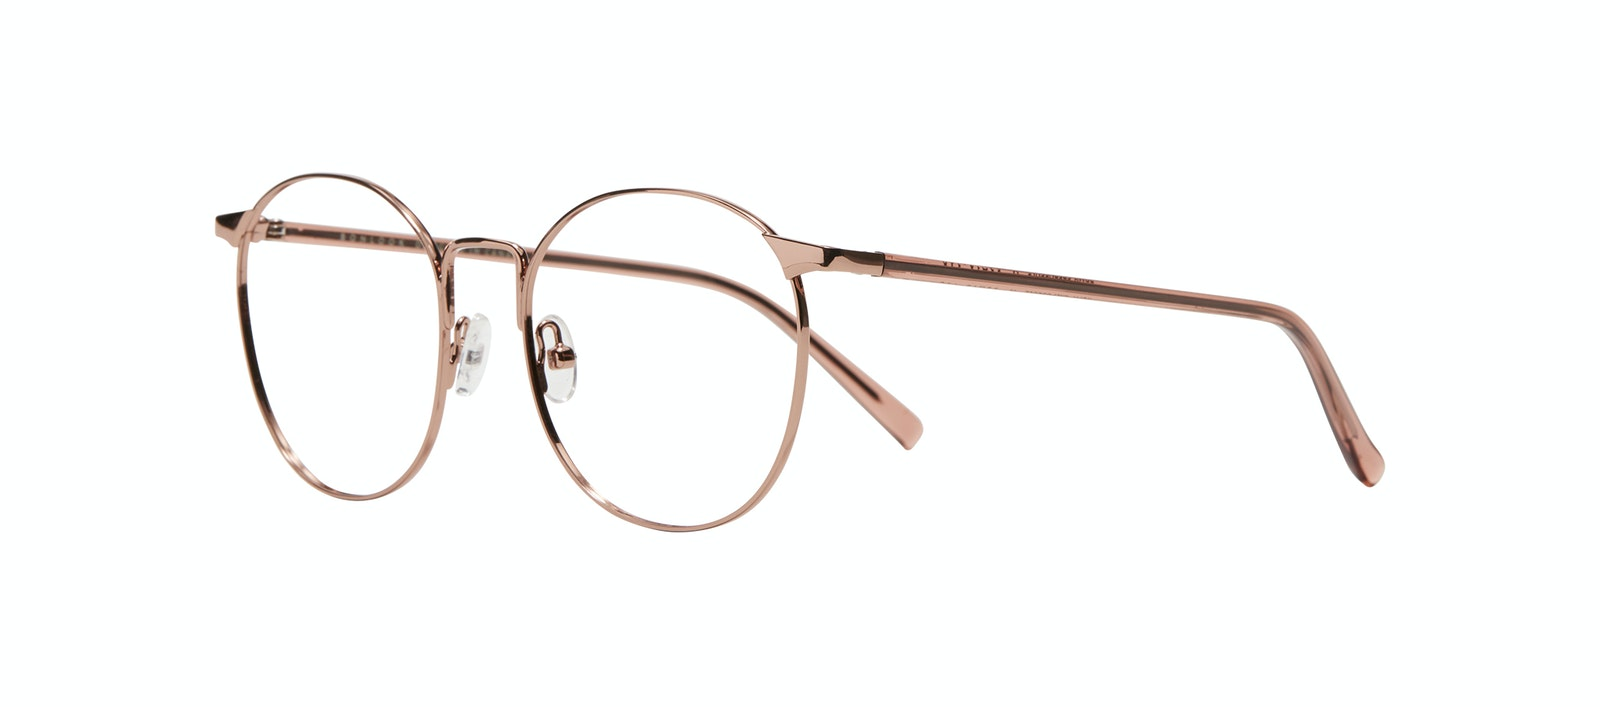 Affordable Fashion Glasses Round Eyeglasses Women Romy Petite Crepuscule Tilt